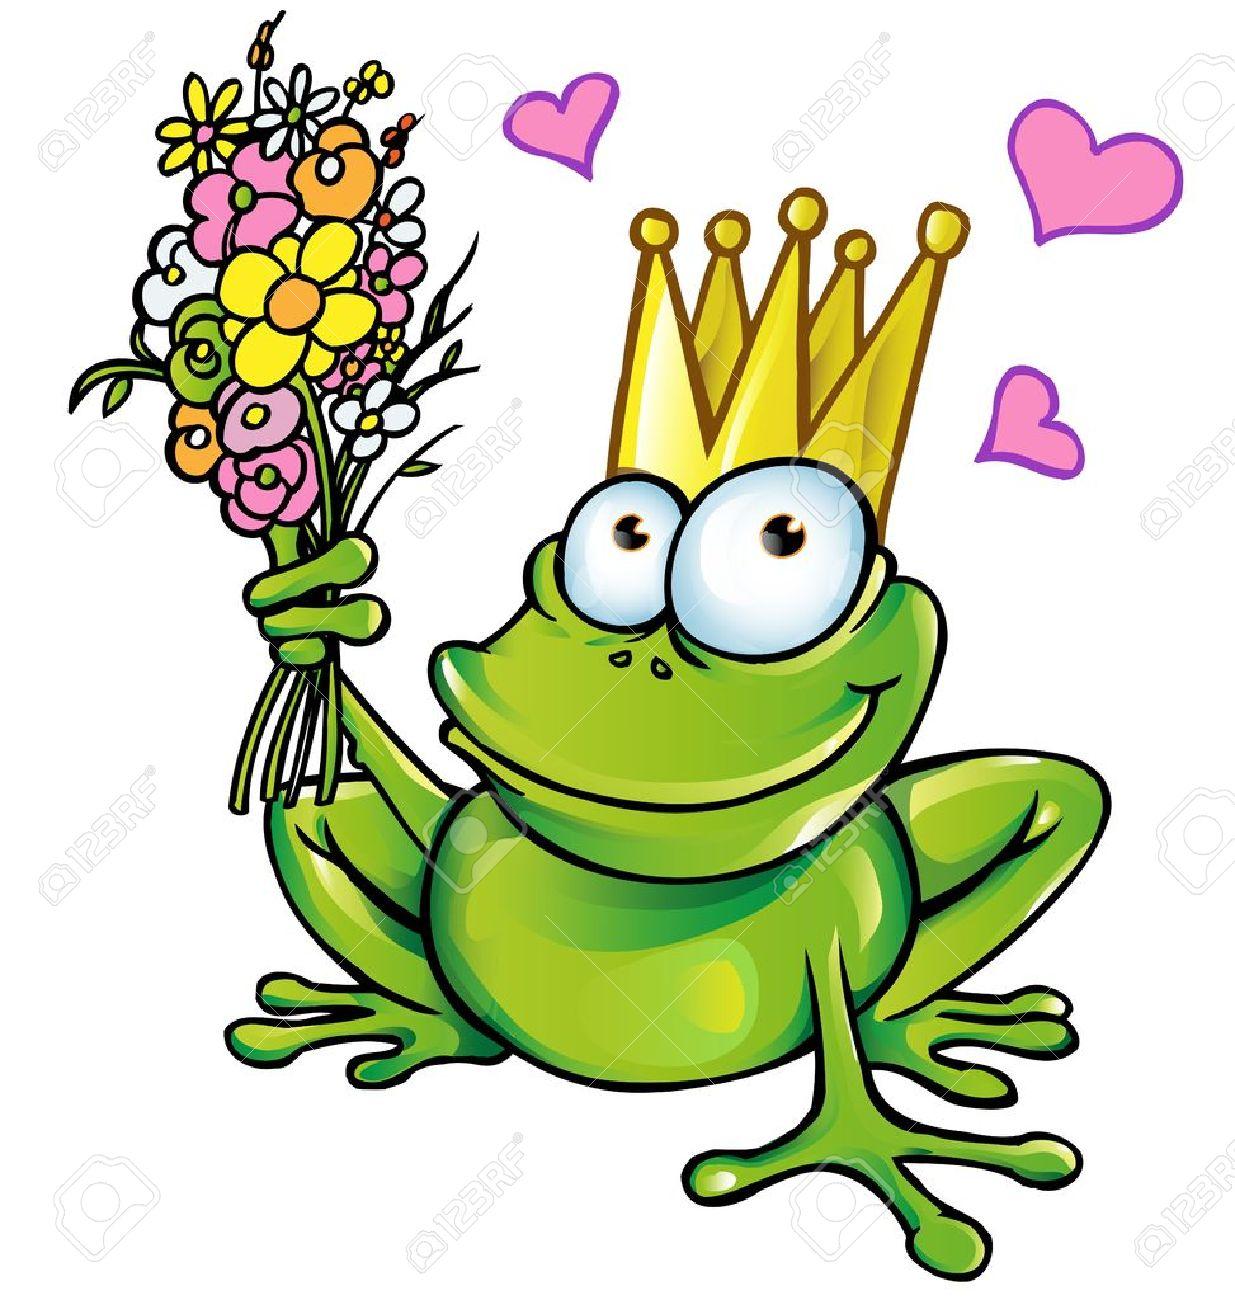 Uncategorized Principe Sapo sapo com bouquet royalty free cliparts vetores e imagens 18514039